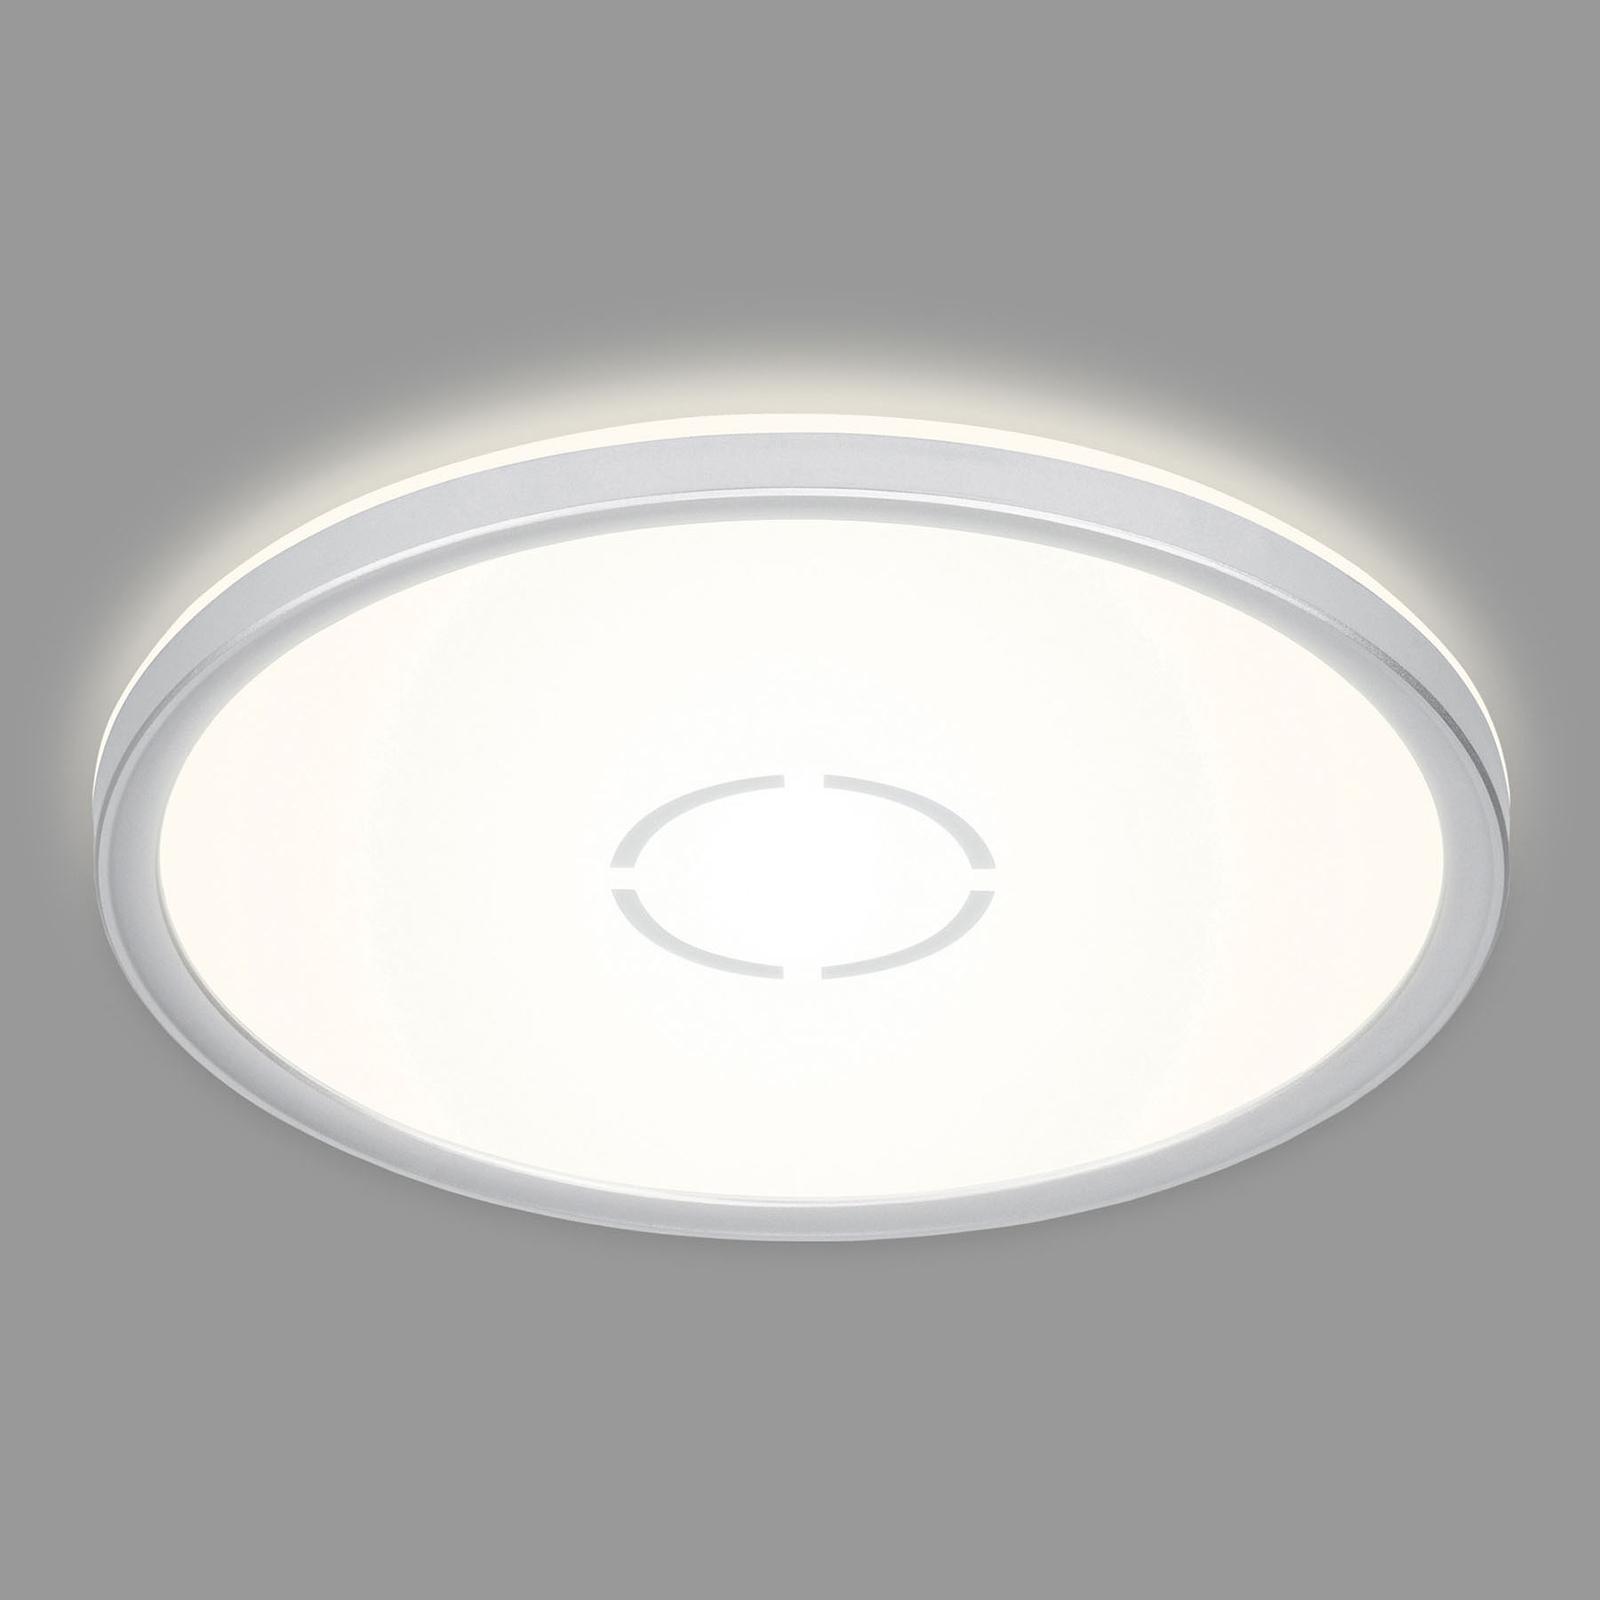 LED plafondlamp Free, Ø 29 cm, zilver